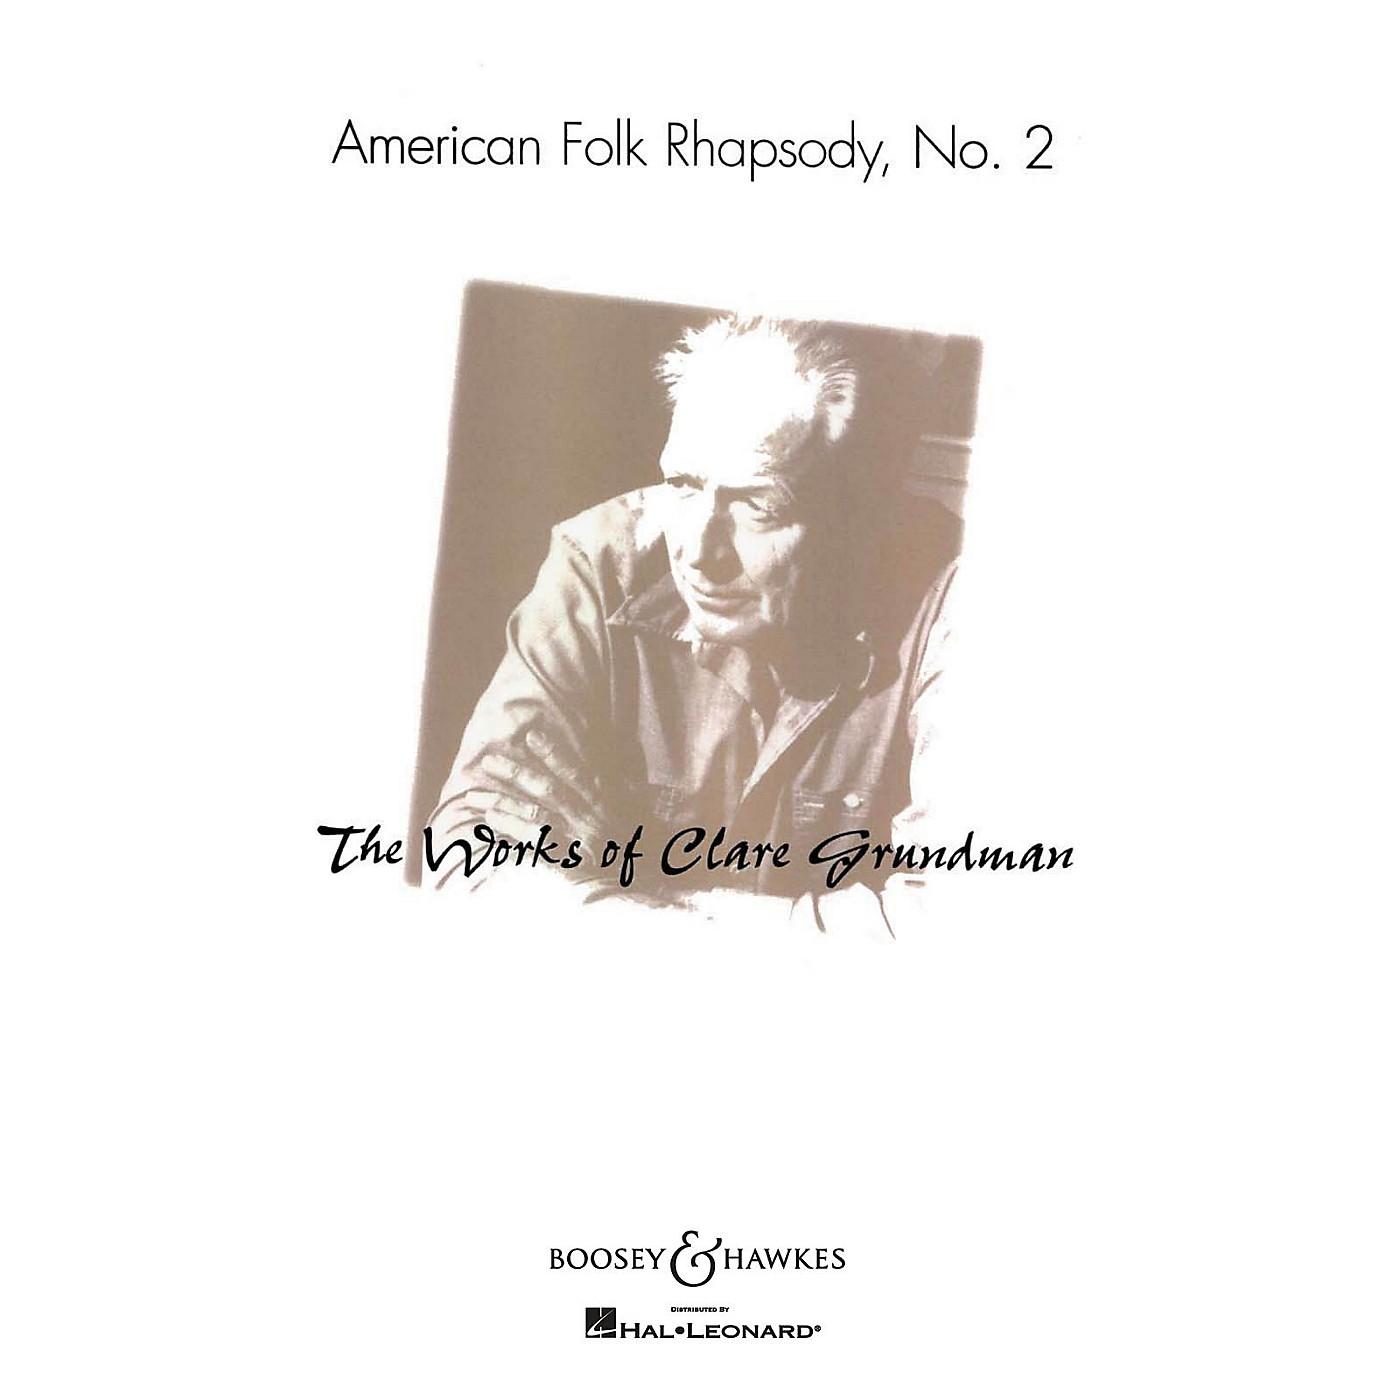 Boosey and Hawkes American Folk Rhapsody No. 2 (American Folk Rhapsody No. 2) Concert Band Level 3-4 by Clare Grundman thumbnail